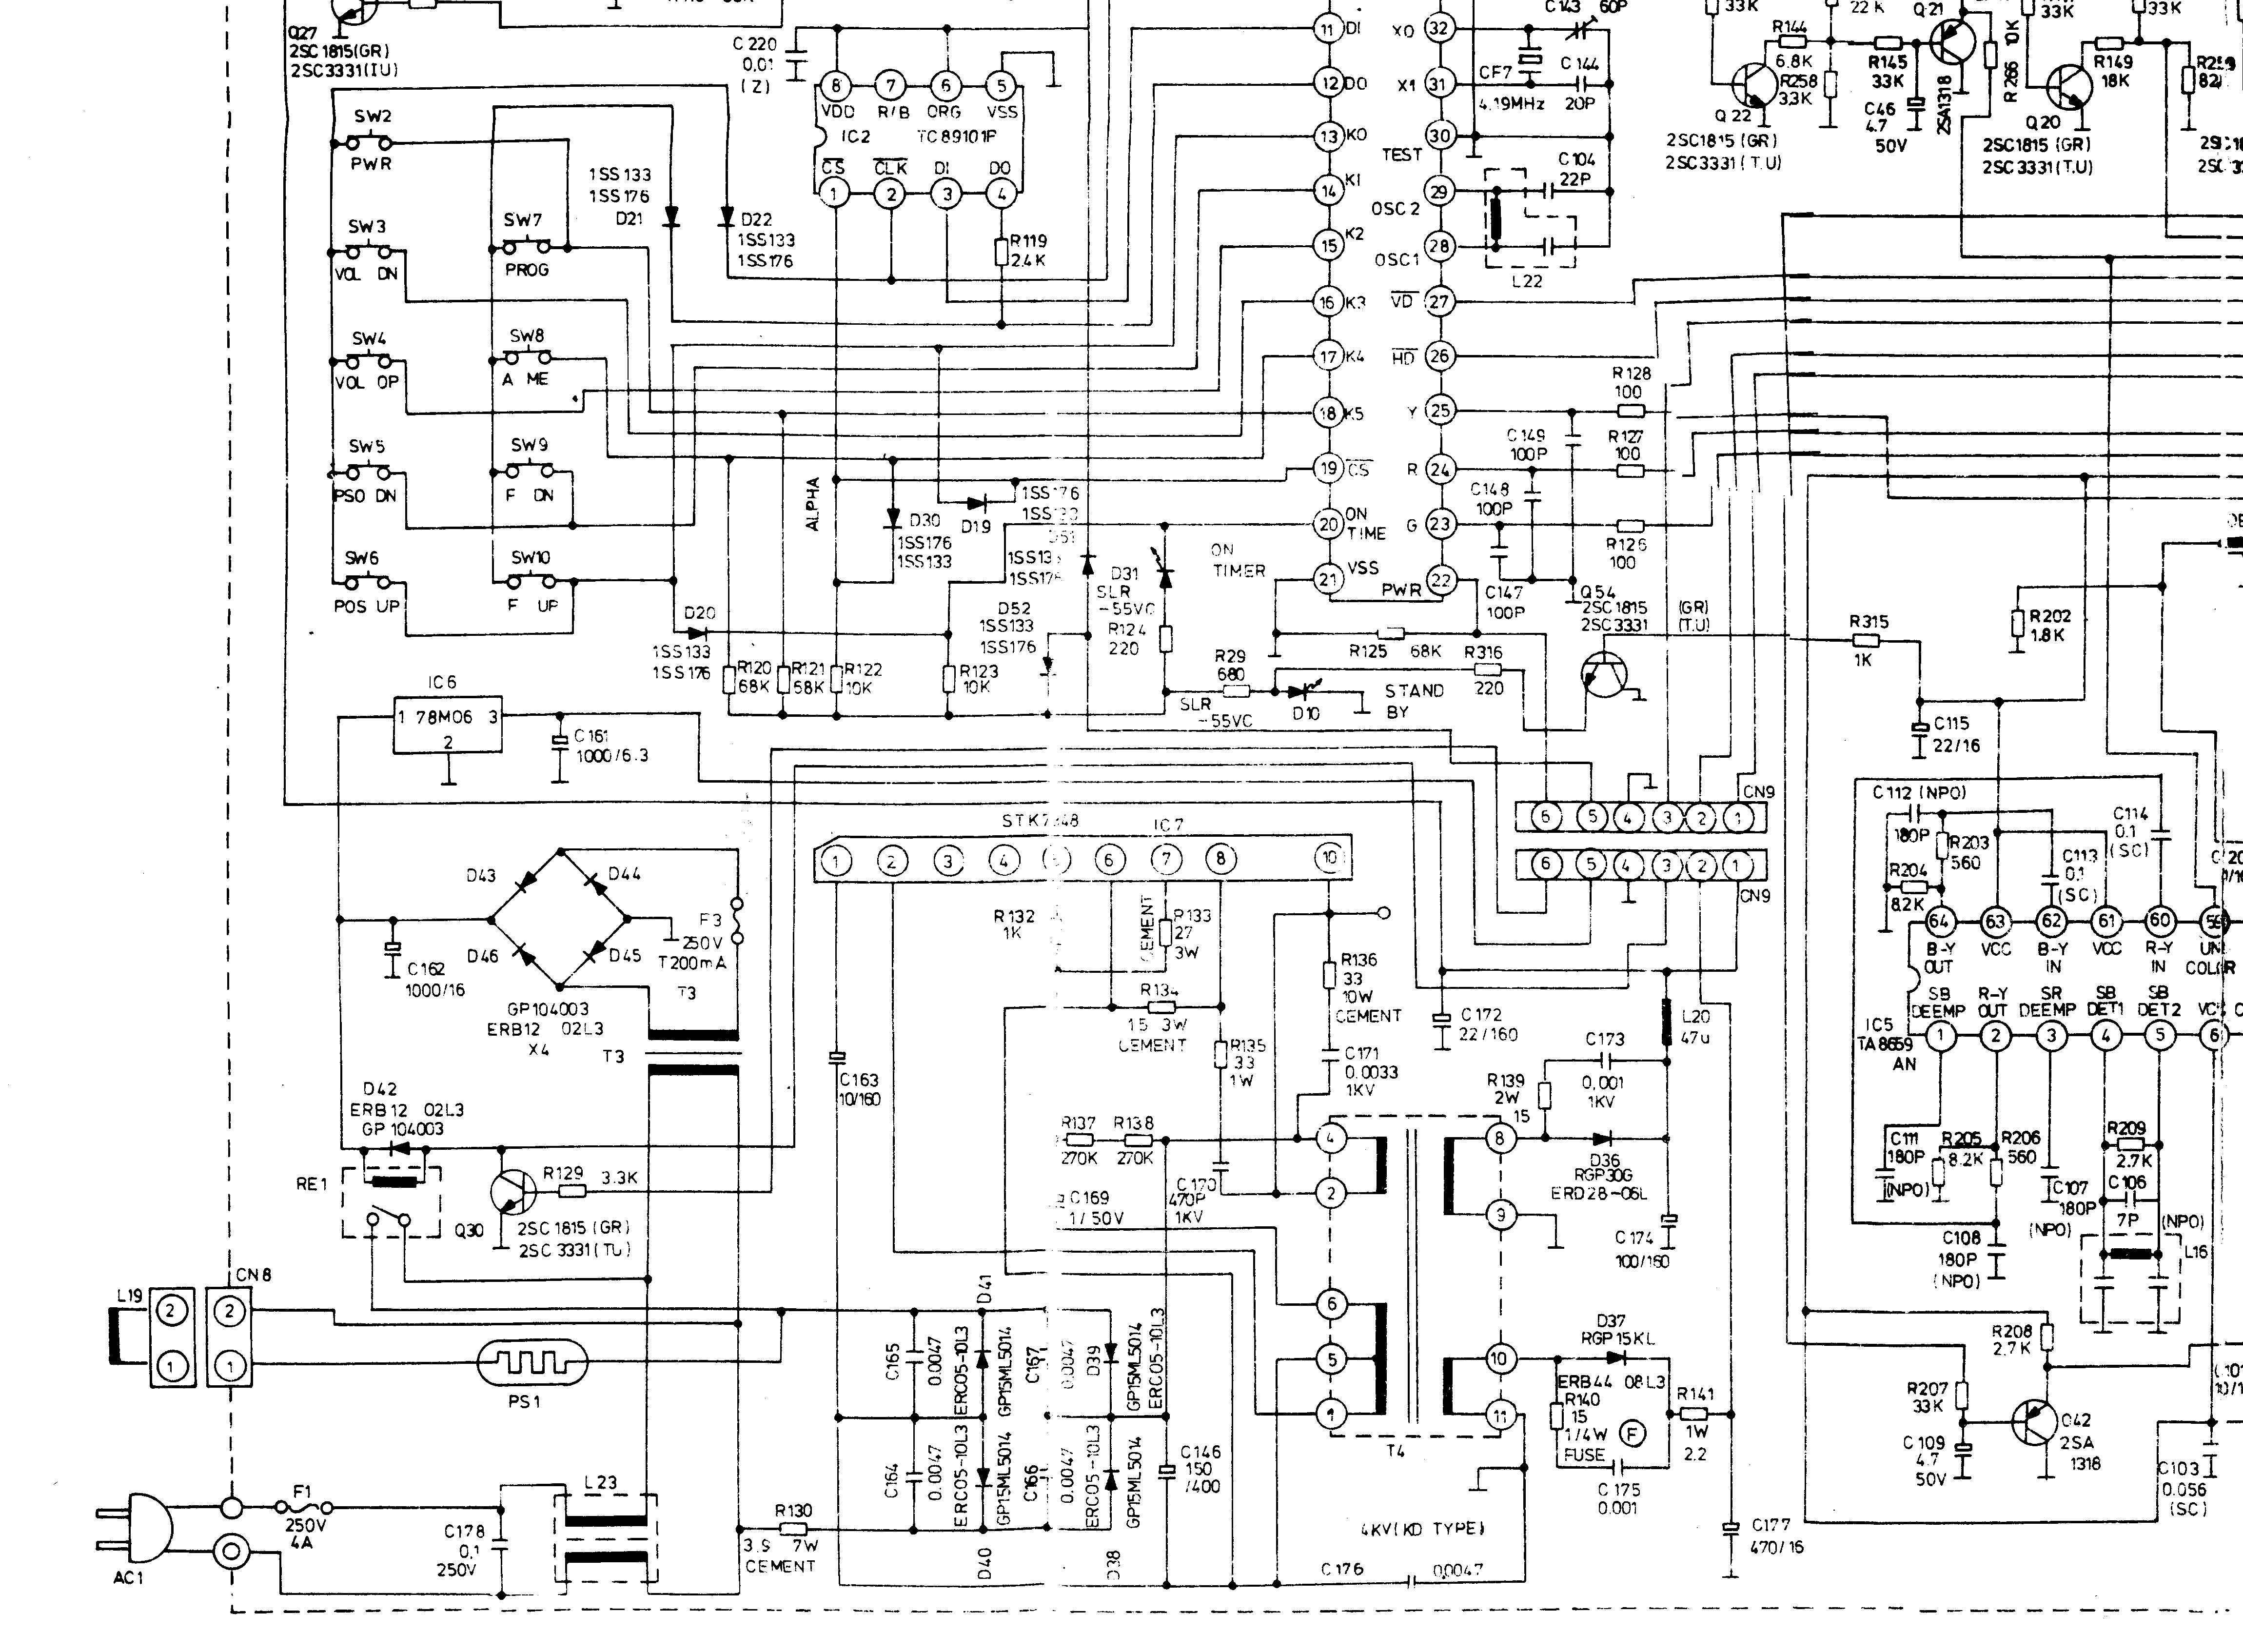 Funai Tv Schematic Diagram Circuit Lg Cf 25h84 Color Power Supply